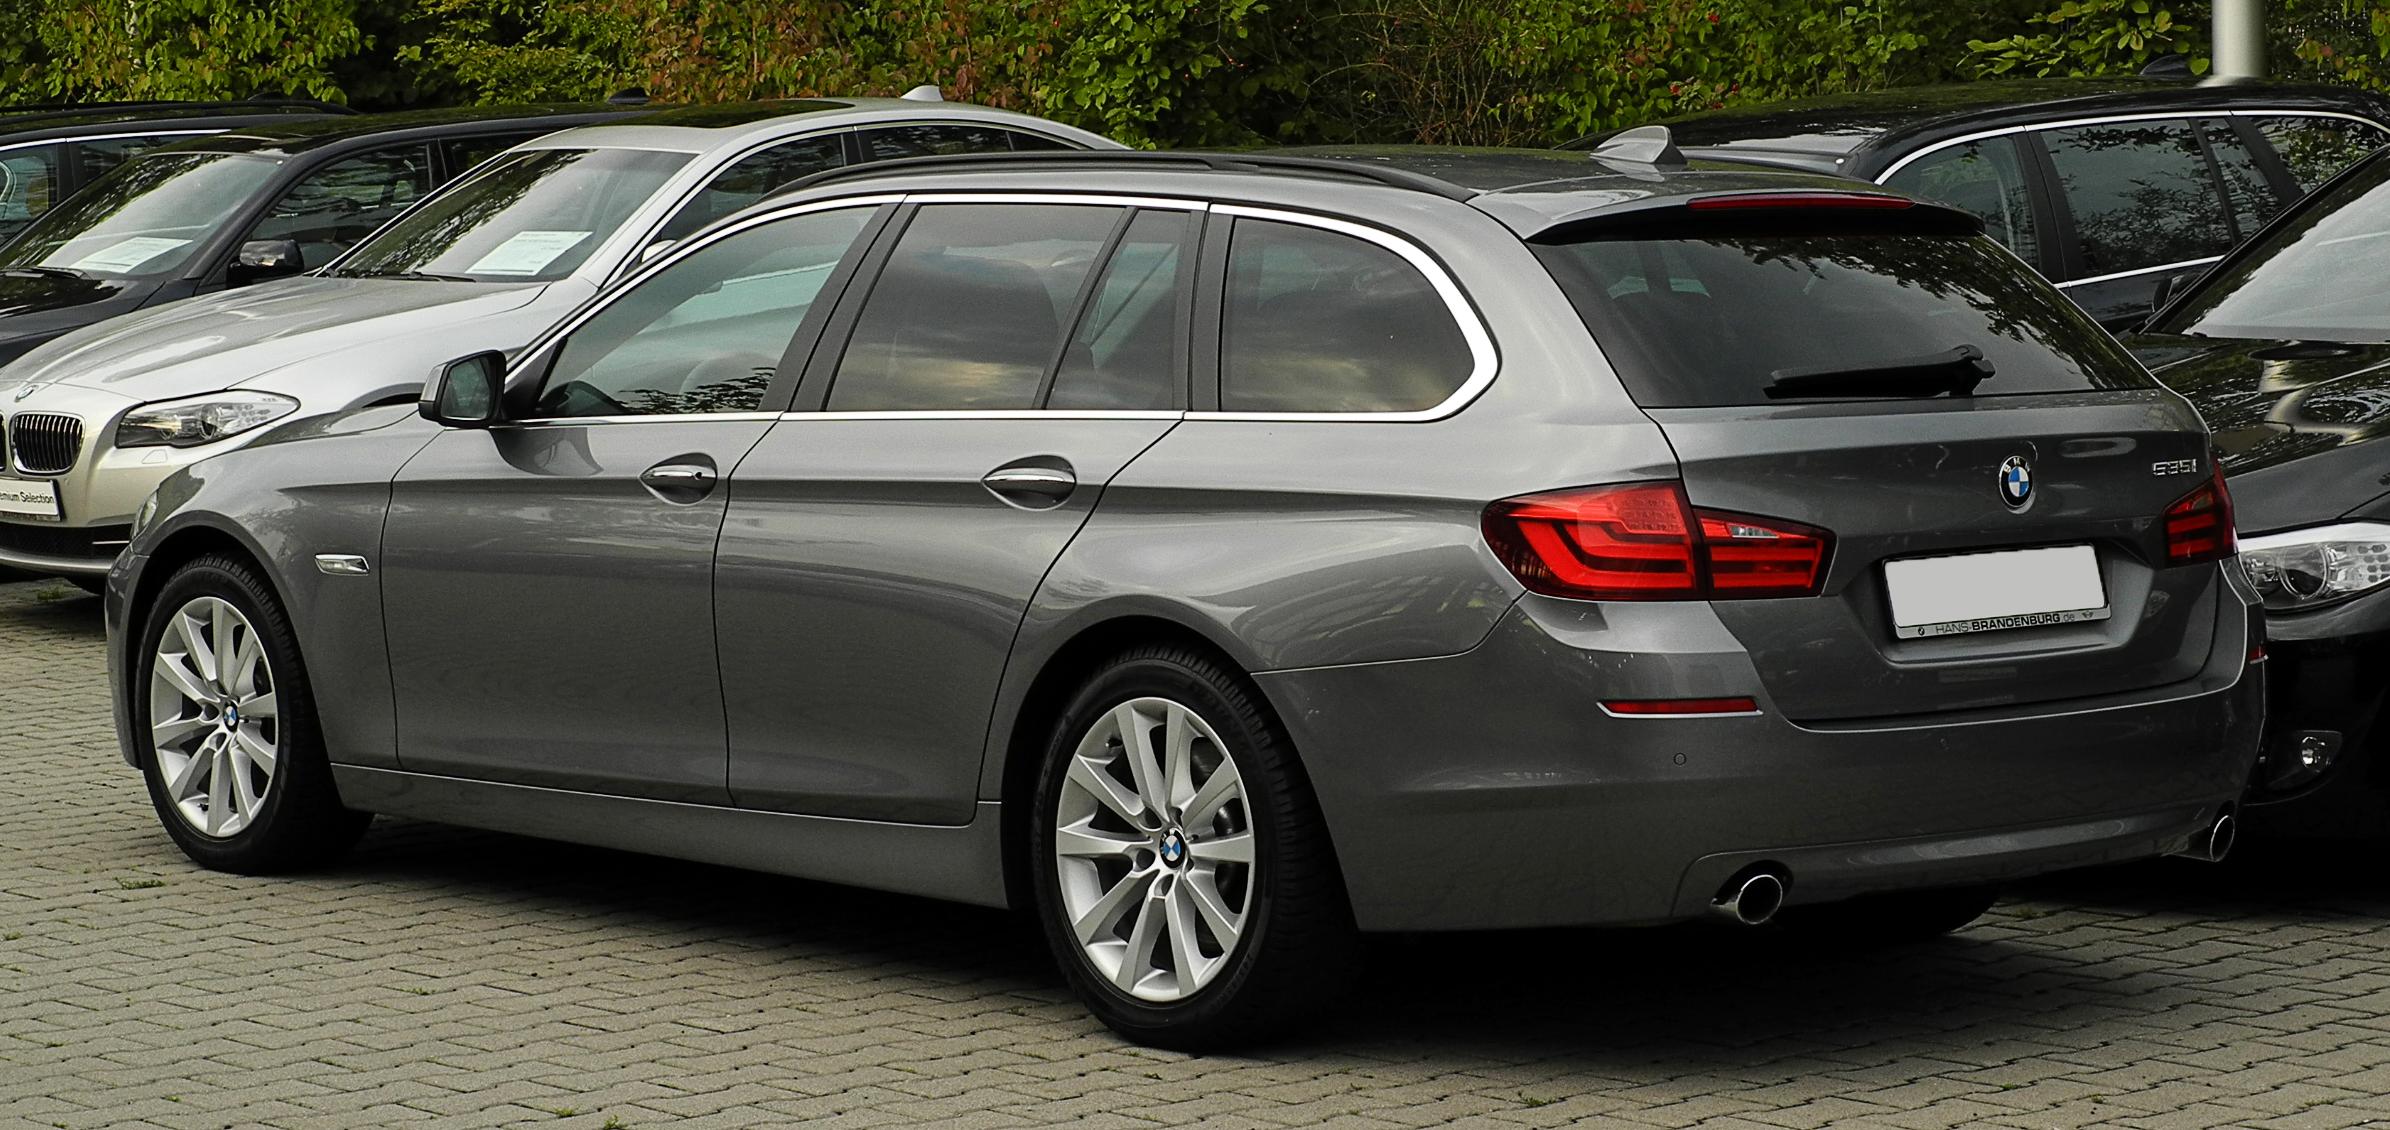 File:BMW 535i Touring (F11) – Heckansicht, 15. August 2011 ...